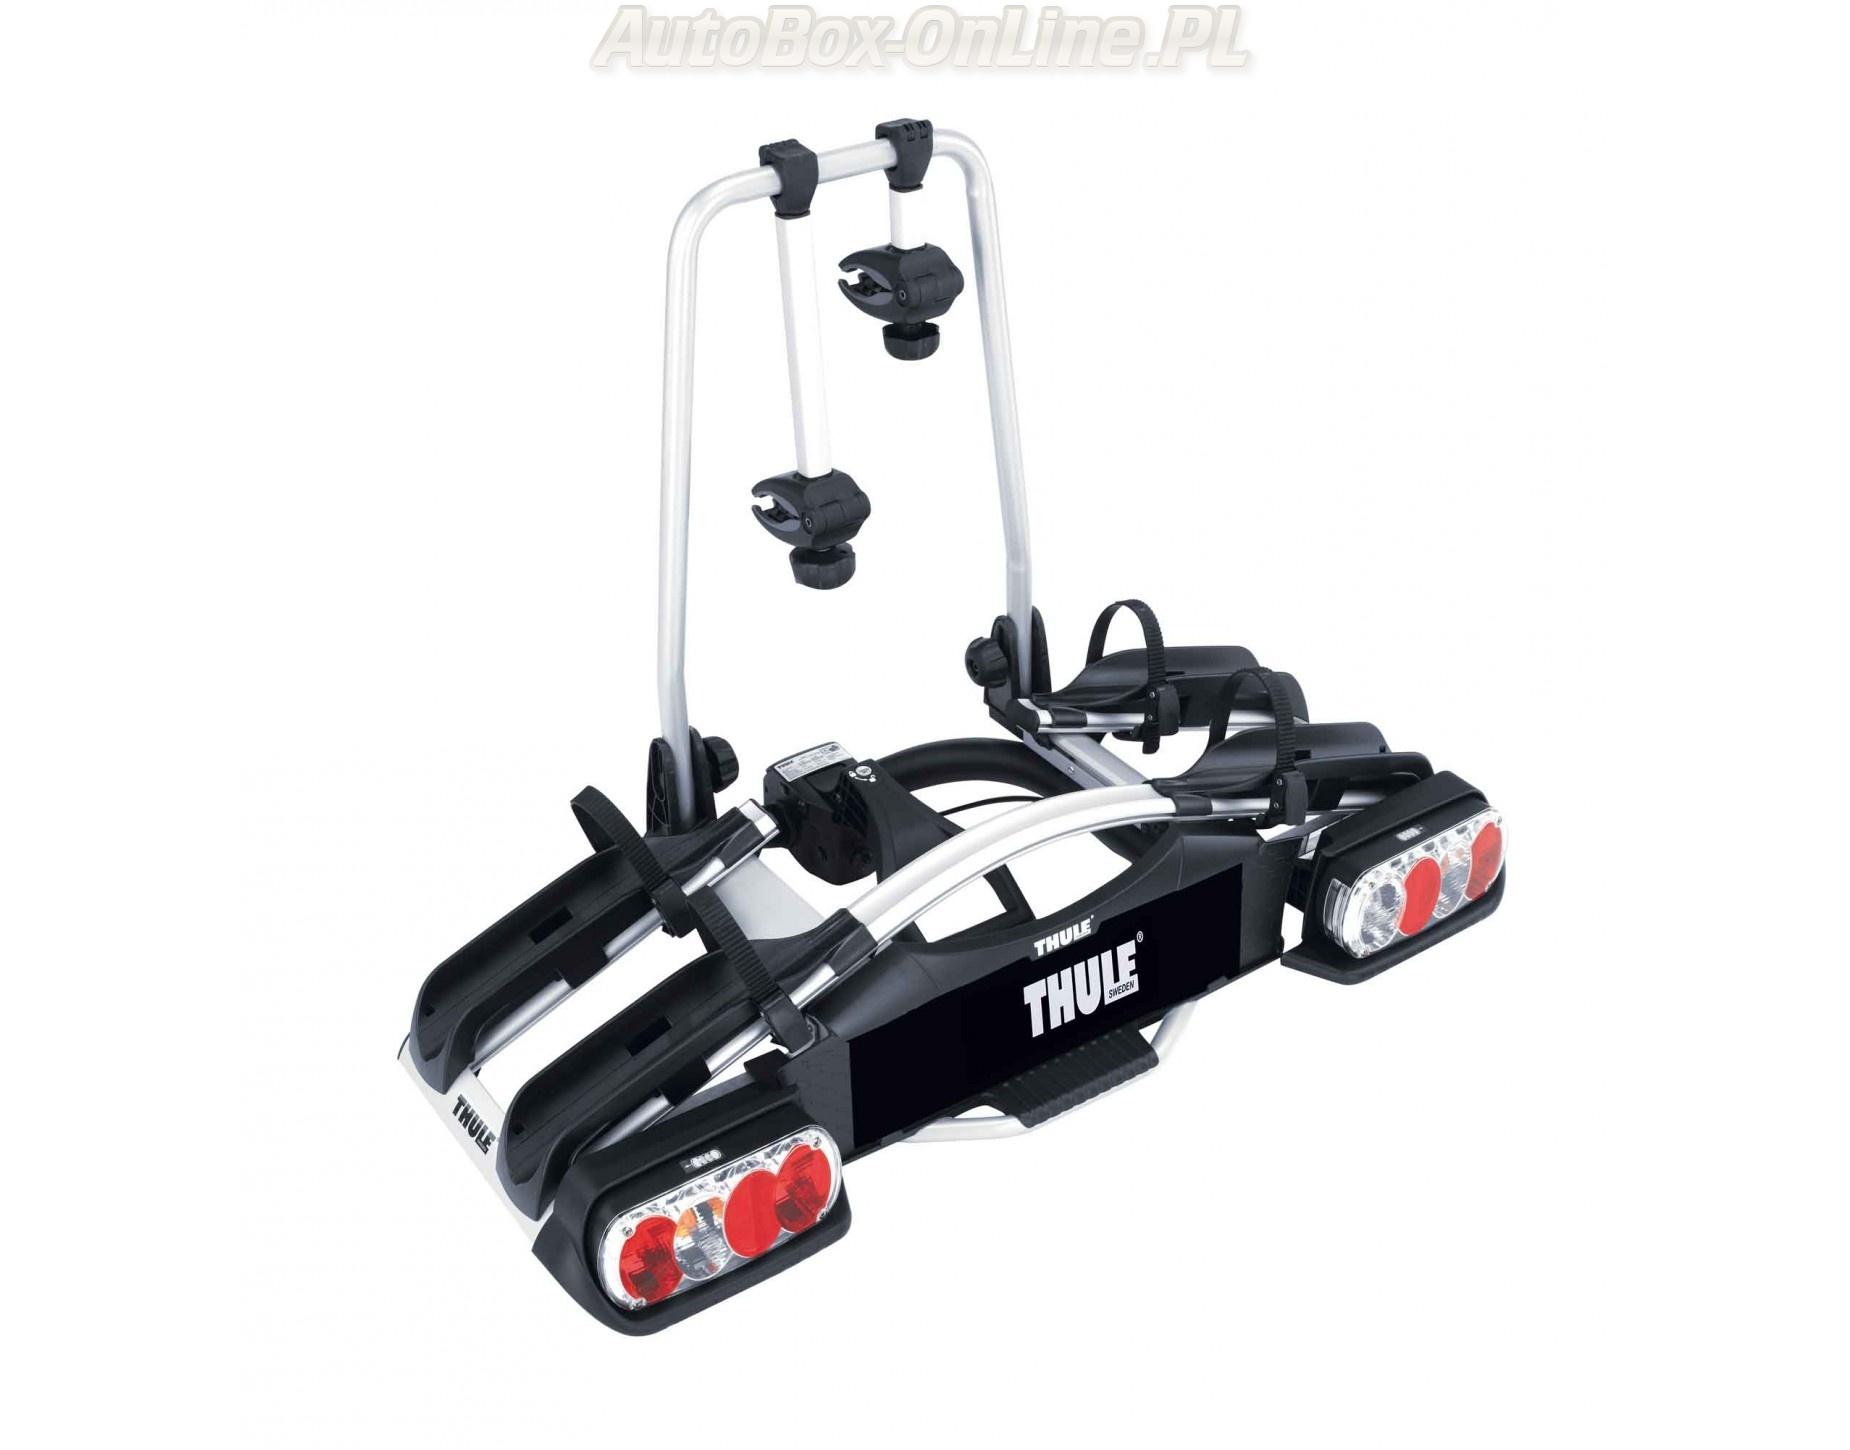 THULE EuroWay 920 G2 Platforma na 2 rowery mocowana na haku ze